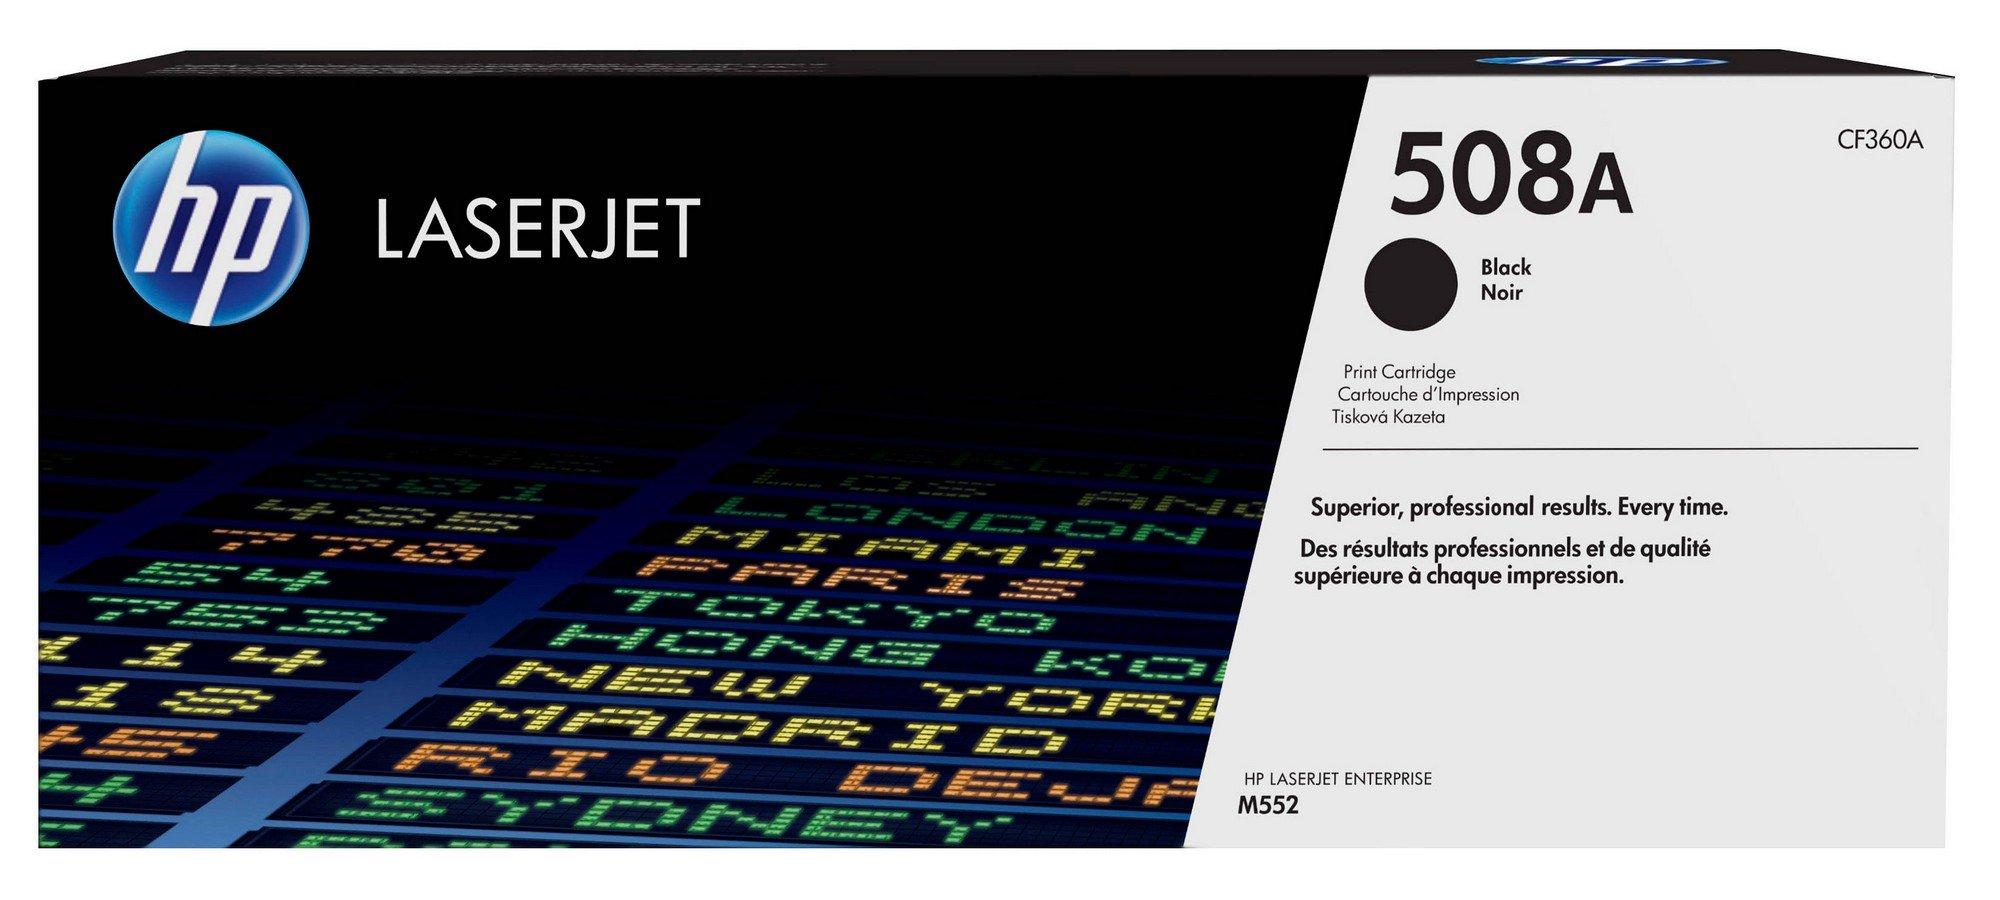 HP 508A (CF360A) Black Original Toner Cartridge by HP